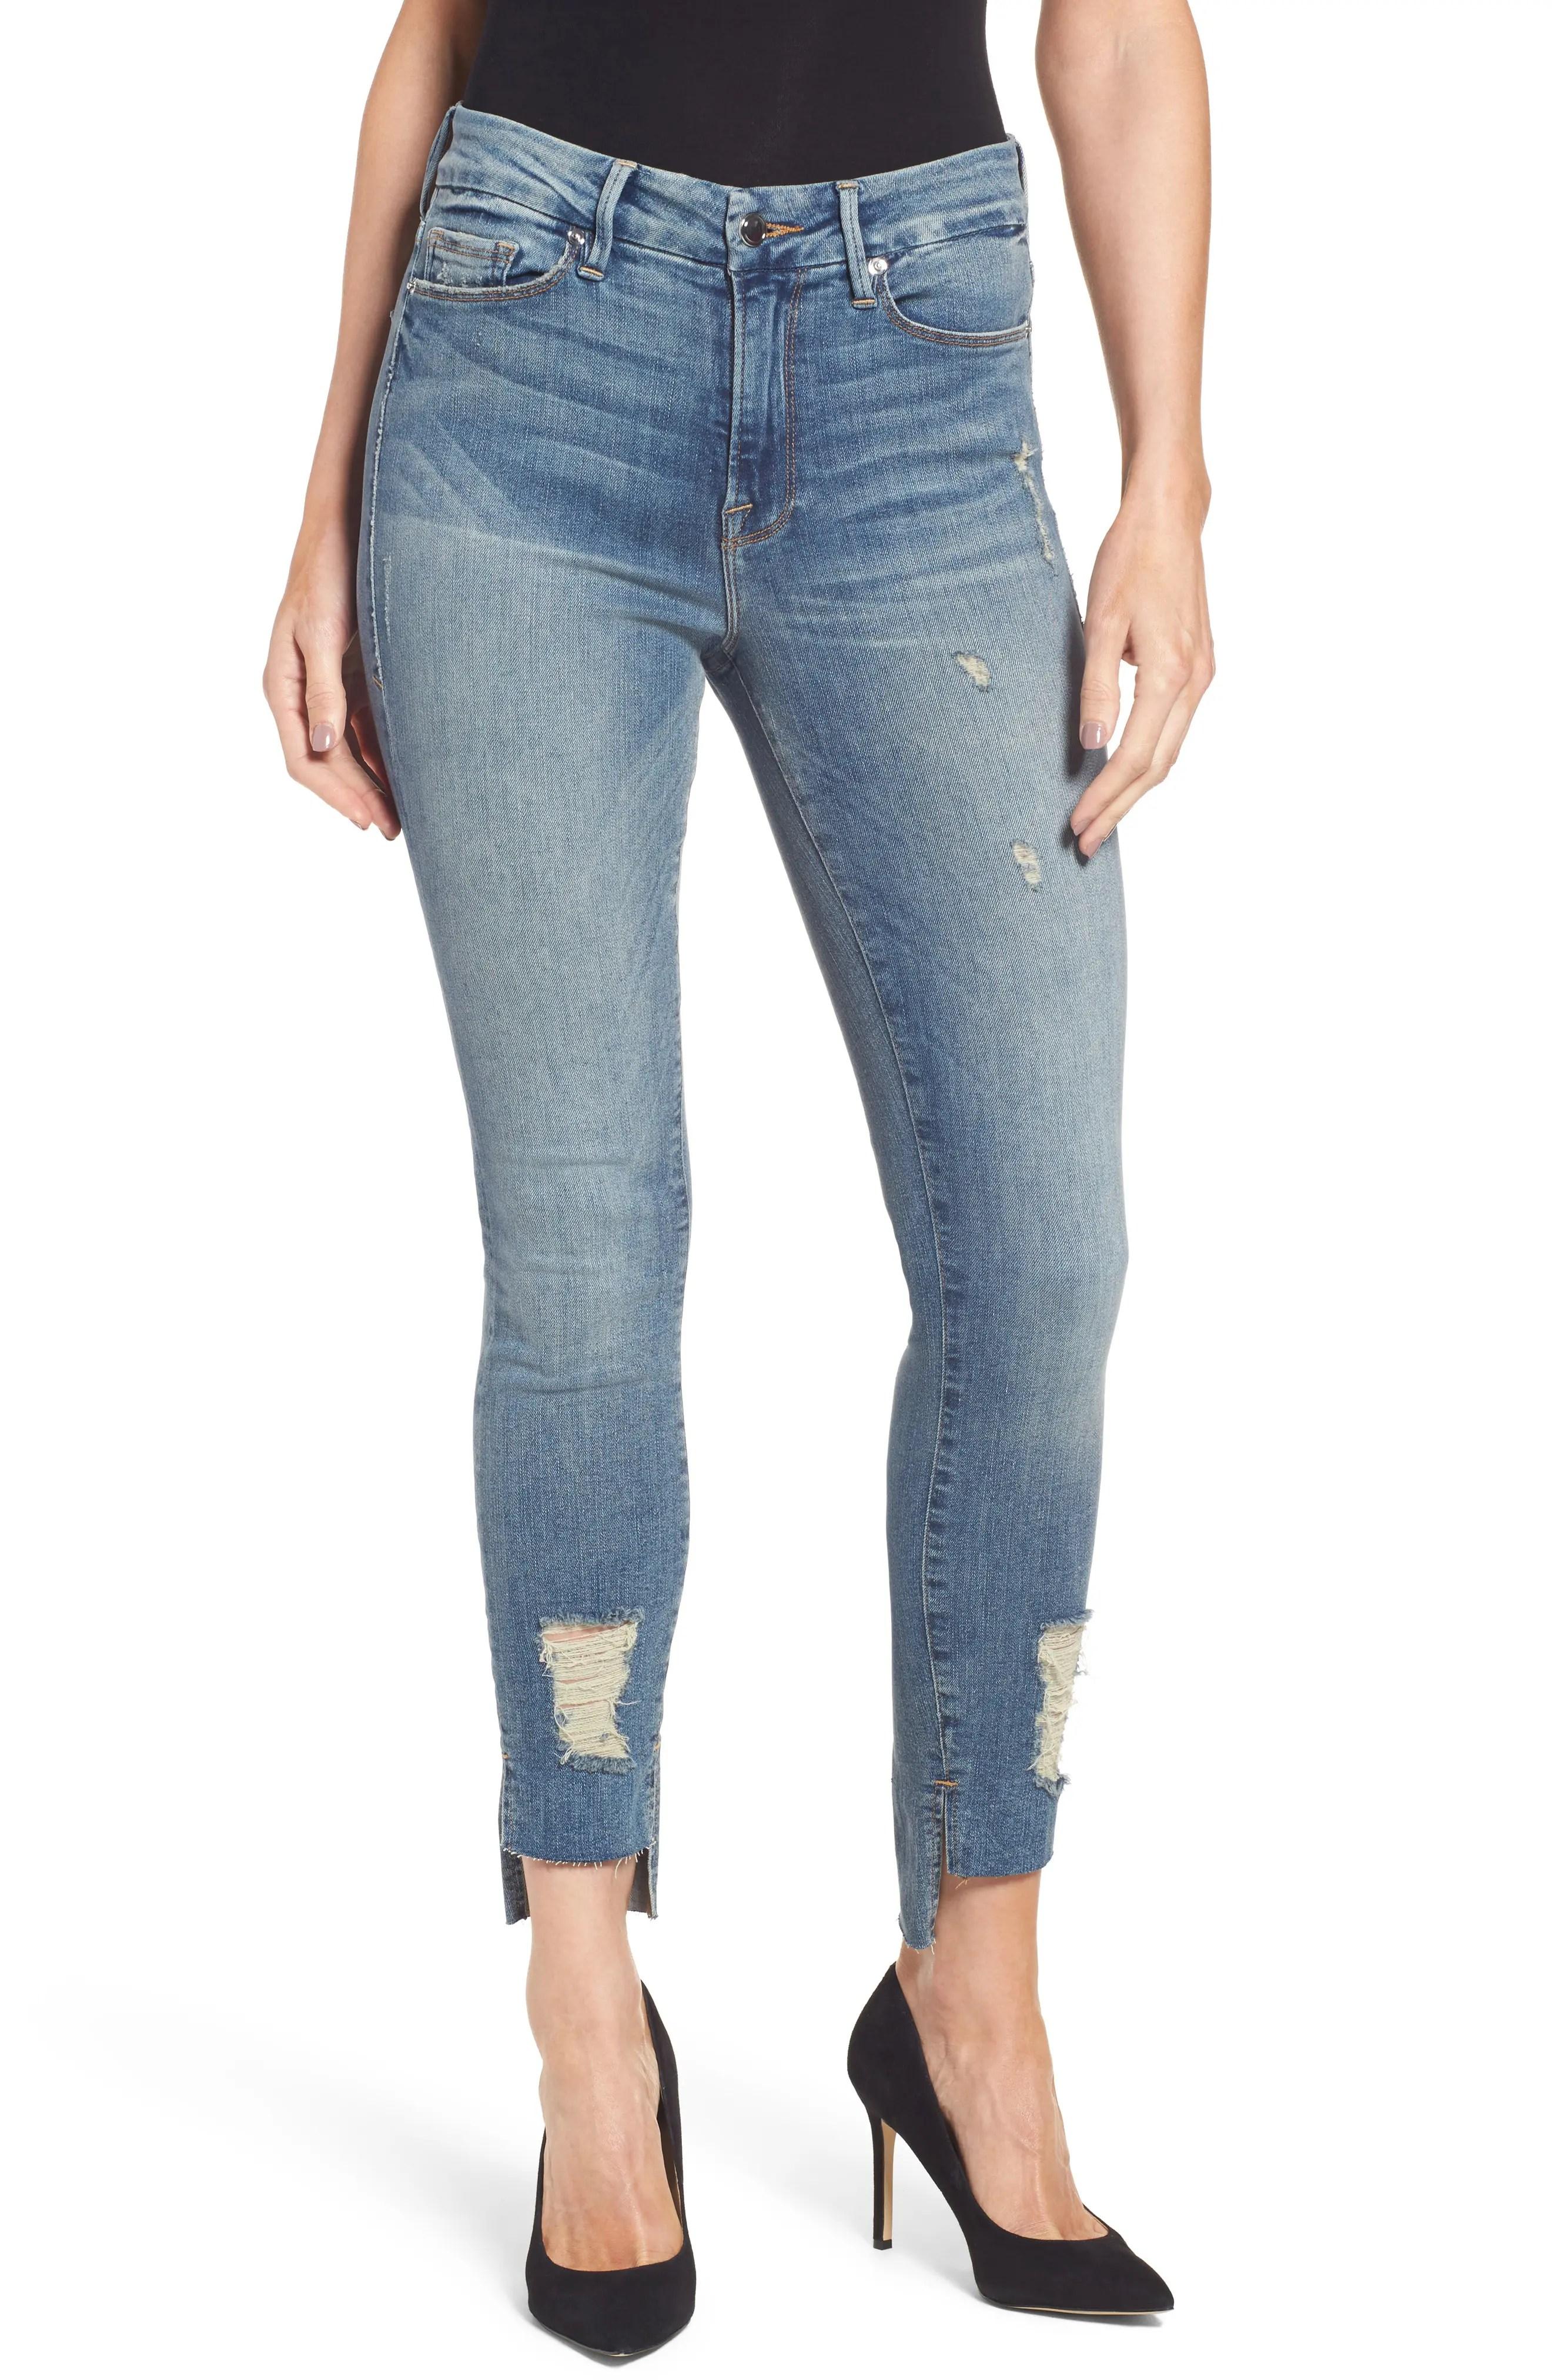 Main Image - Good American Good Legs High Waist Skinny Jeans (Blue 082)